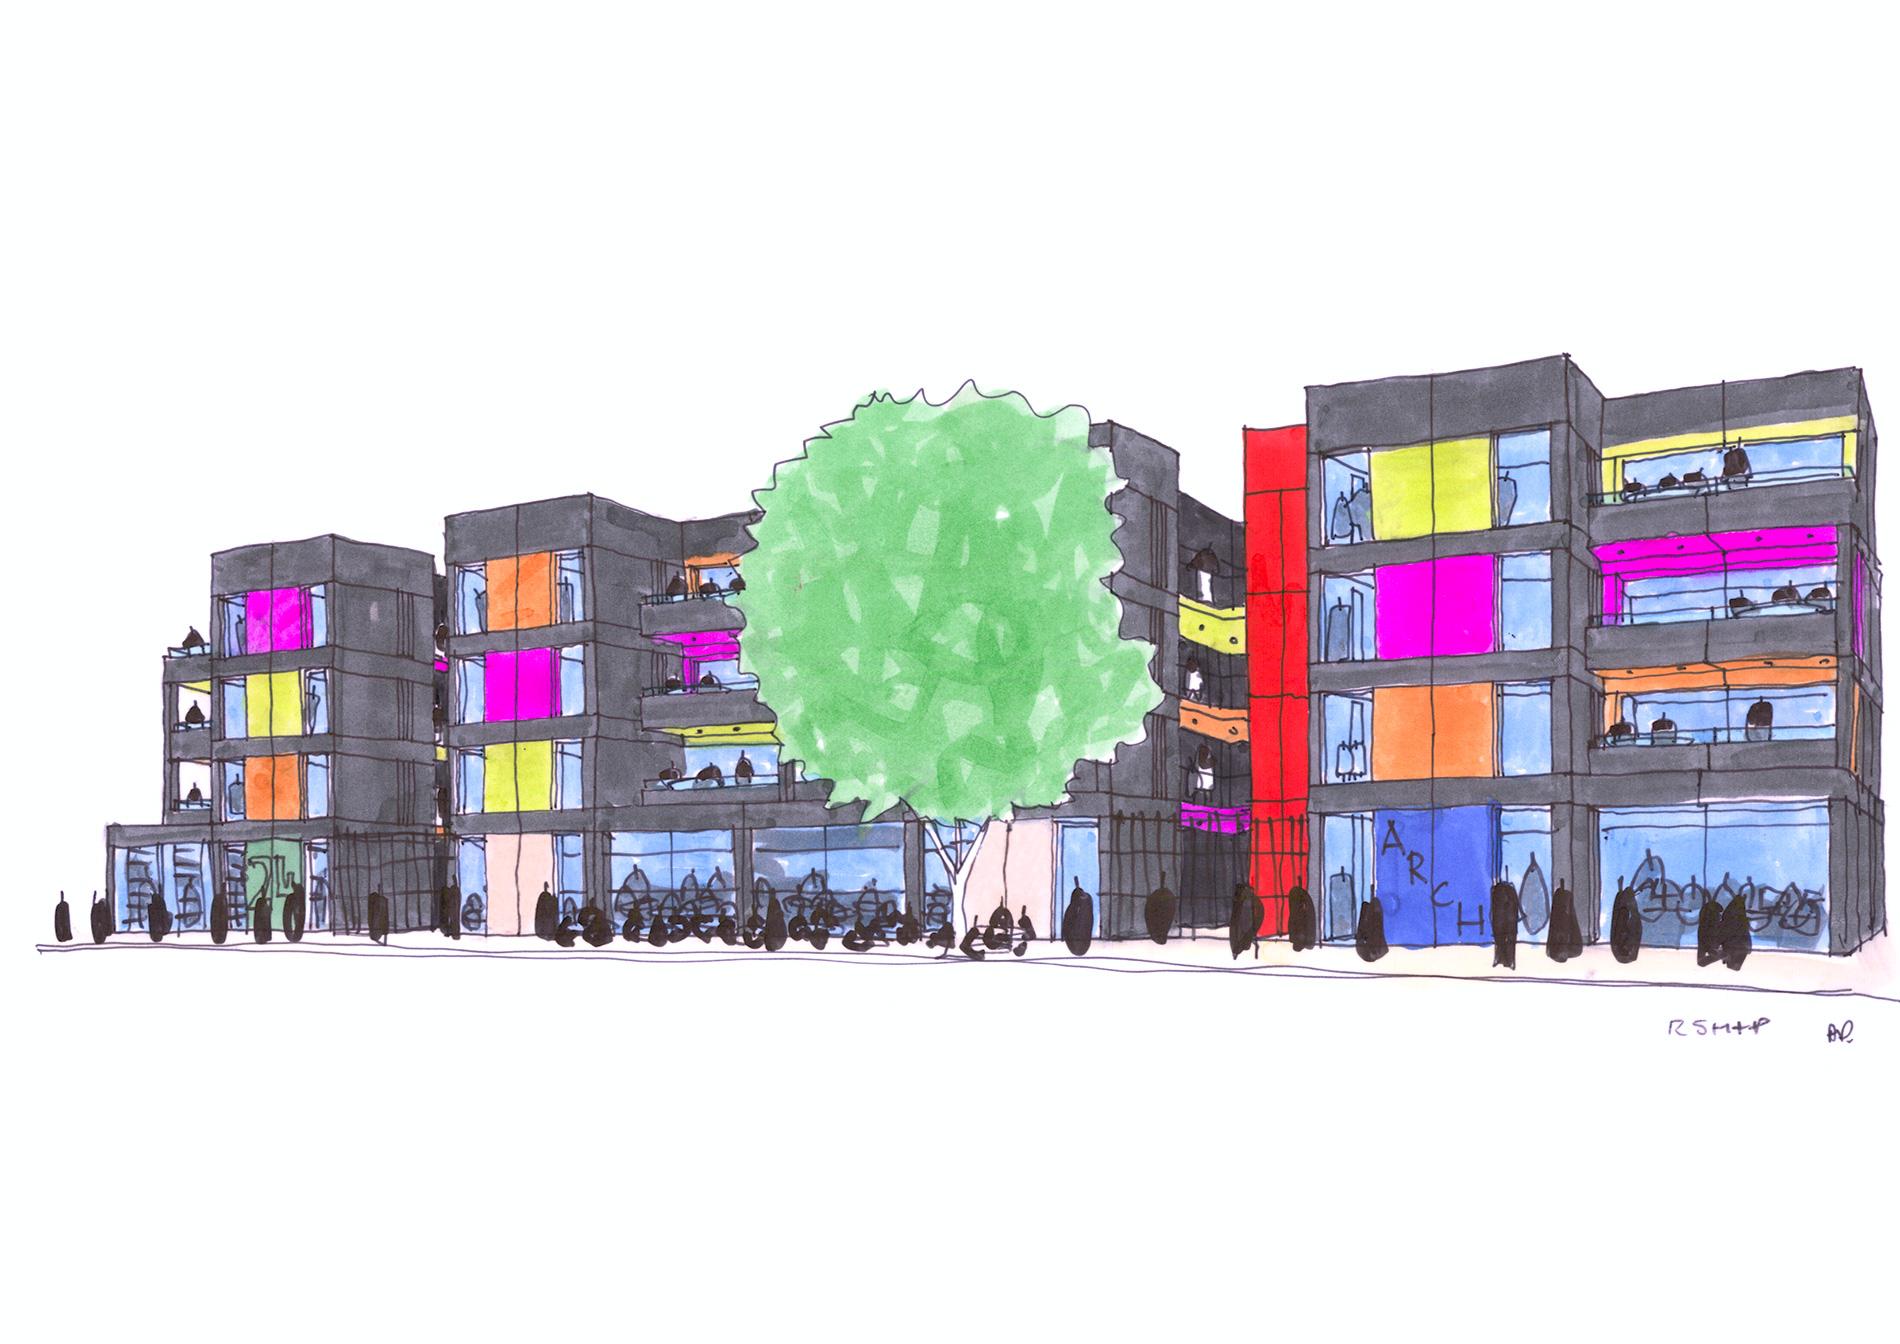 Proposed Lewisham Development. Photo Credit: RSH+partners